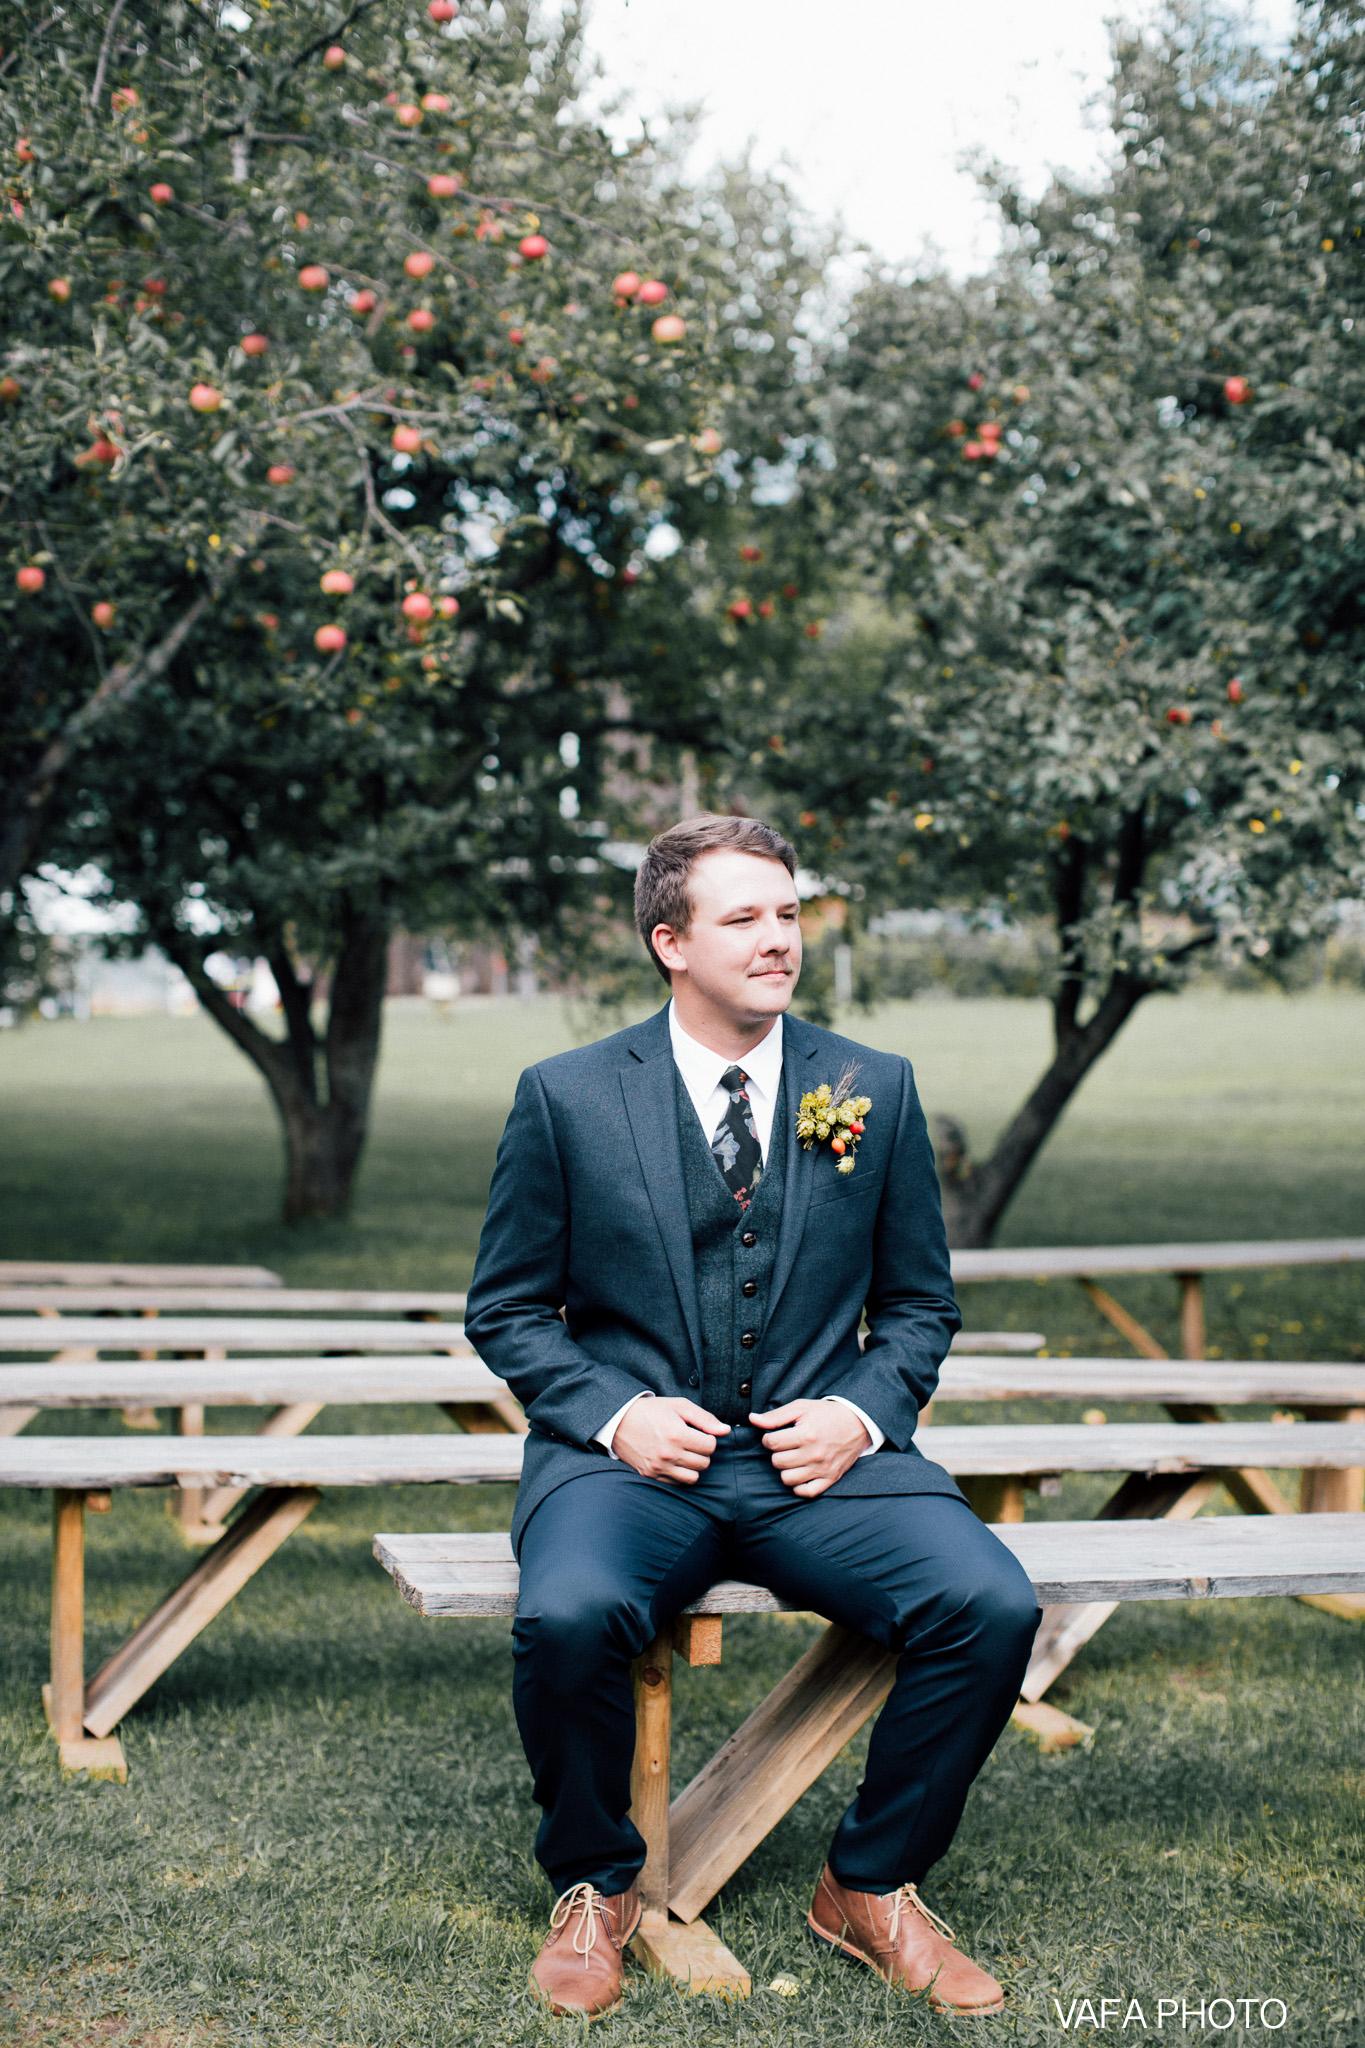 Belsolda-Farm-Wedding-Christy-Eric-Vafa-Photo-108.jpg